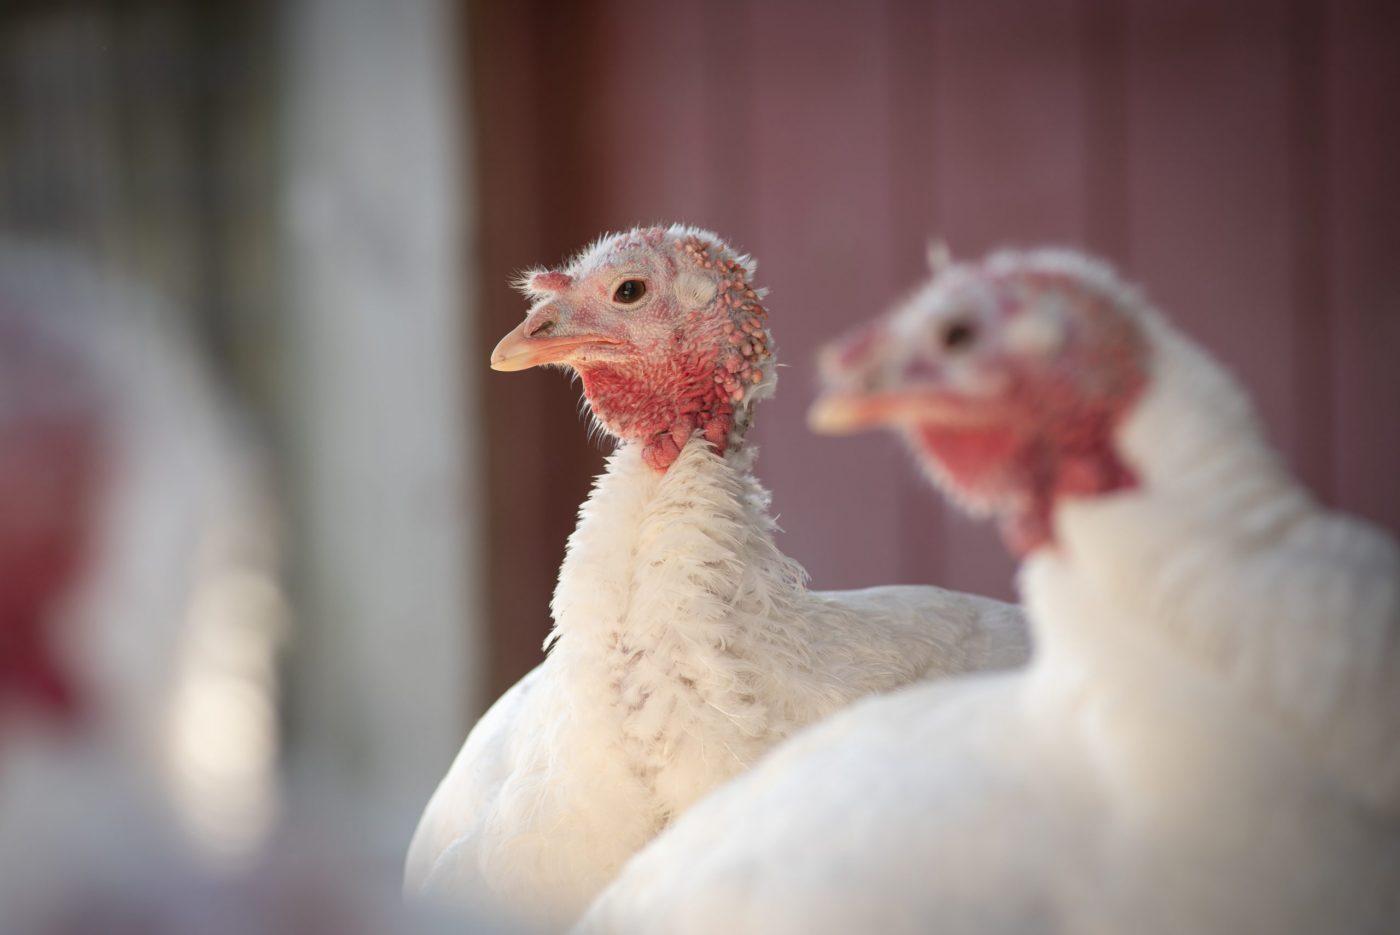 Two turkeys at Farm Sanctuary